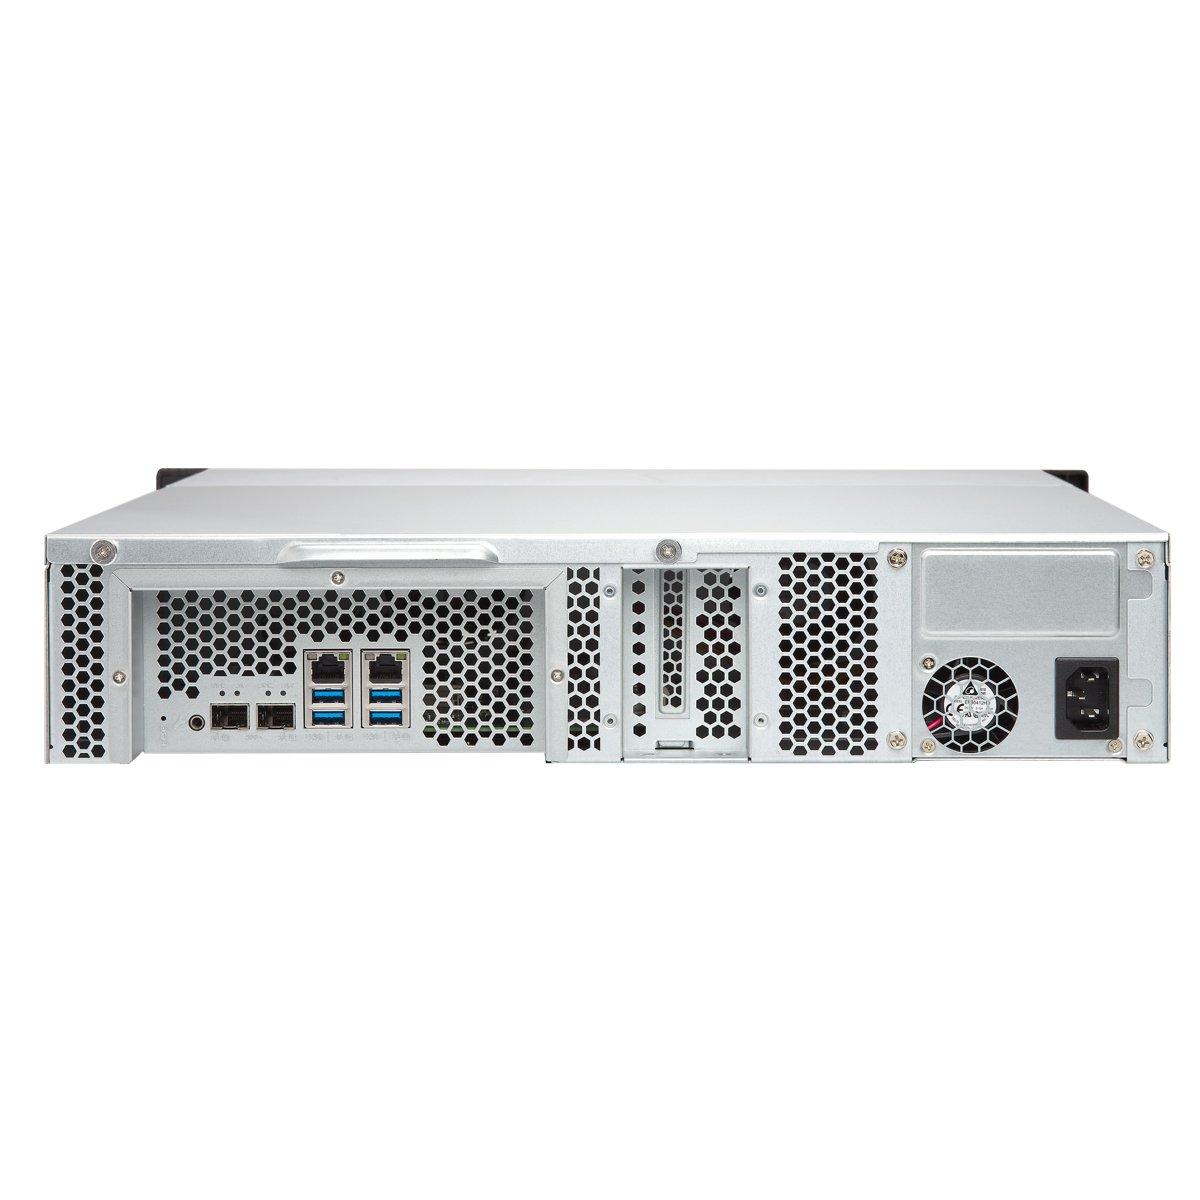 Qnap TS-831XU-4G-US 8-Bay ARM-based 10G NAS, Quad Core 1.7GHz, 4GB DDR3 RAM, 2 x 10GbE SFP+, 2 x GbE, Single Power Supply by QNAP (Image #4)